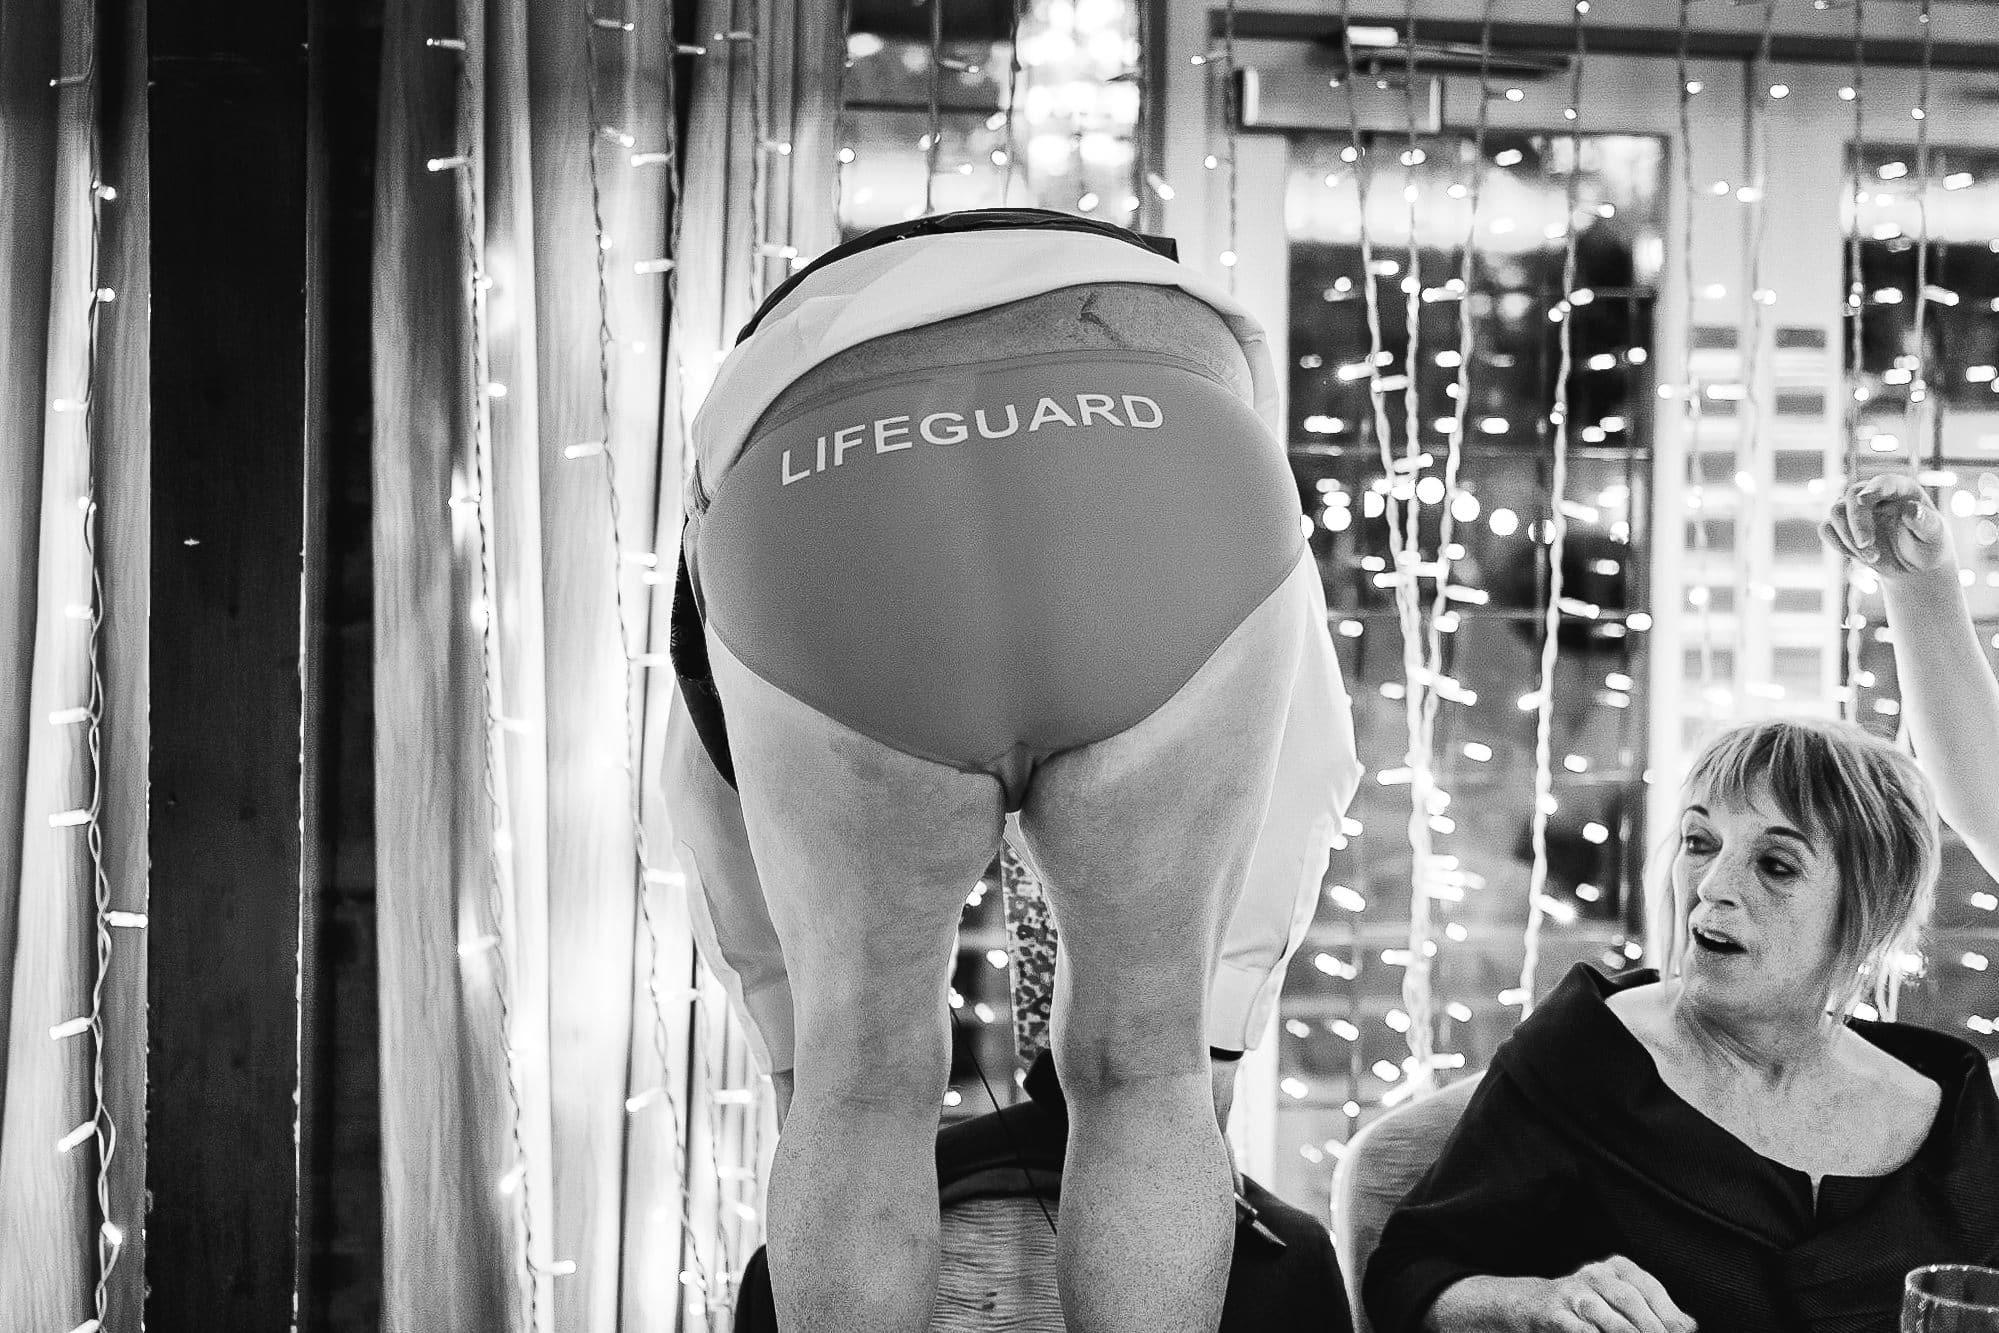 Lifeguard pants at Colshaw Hall